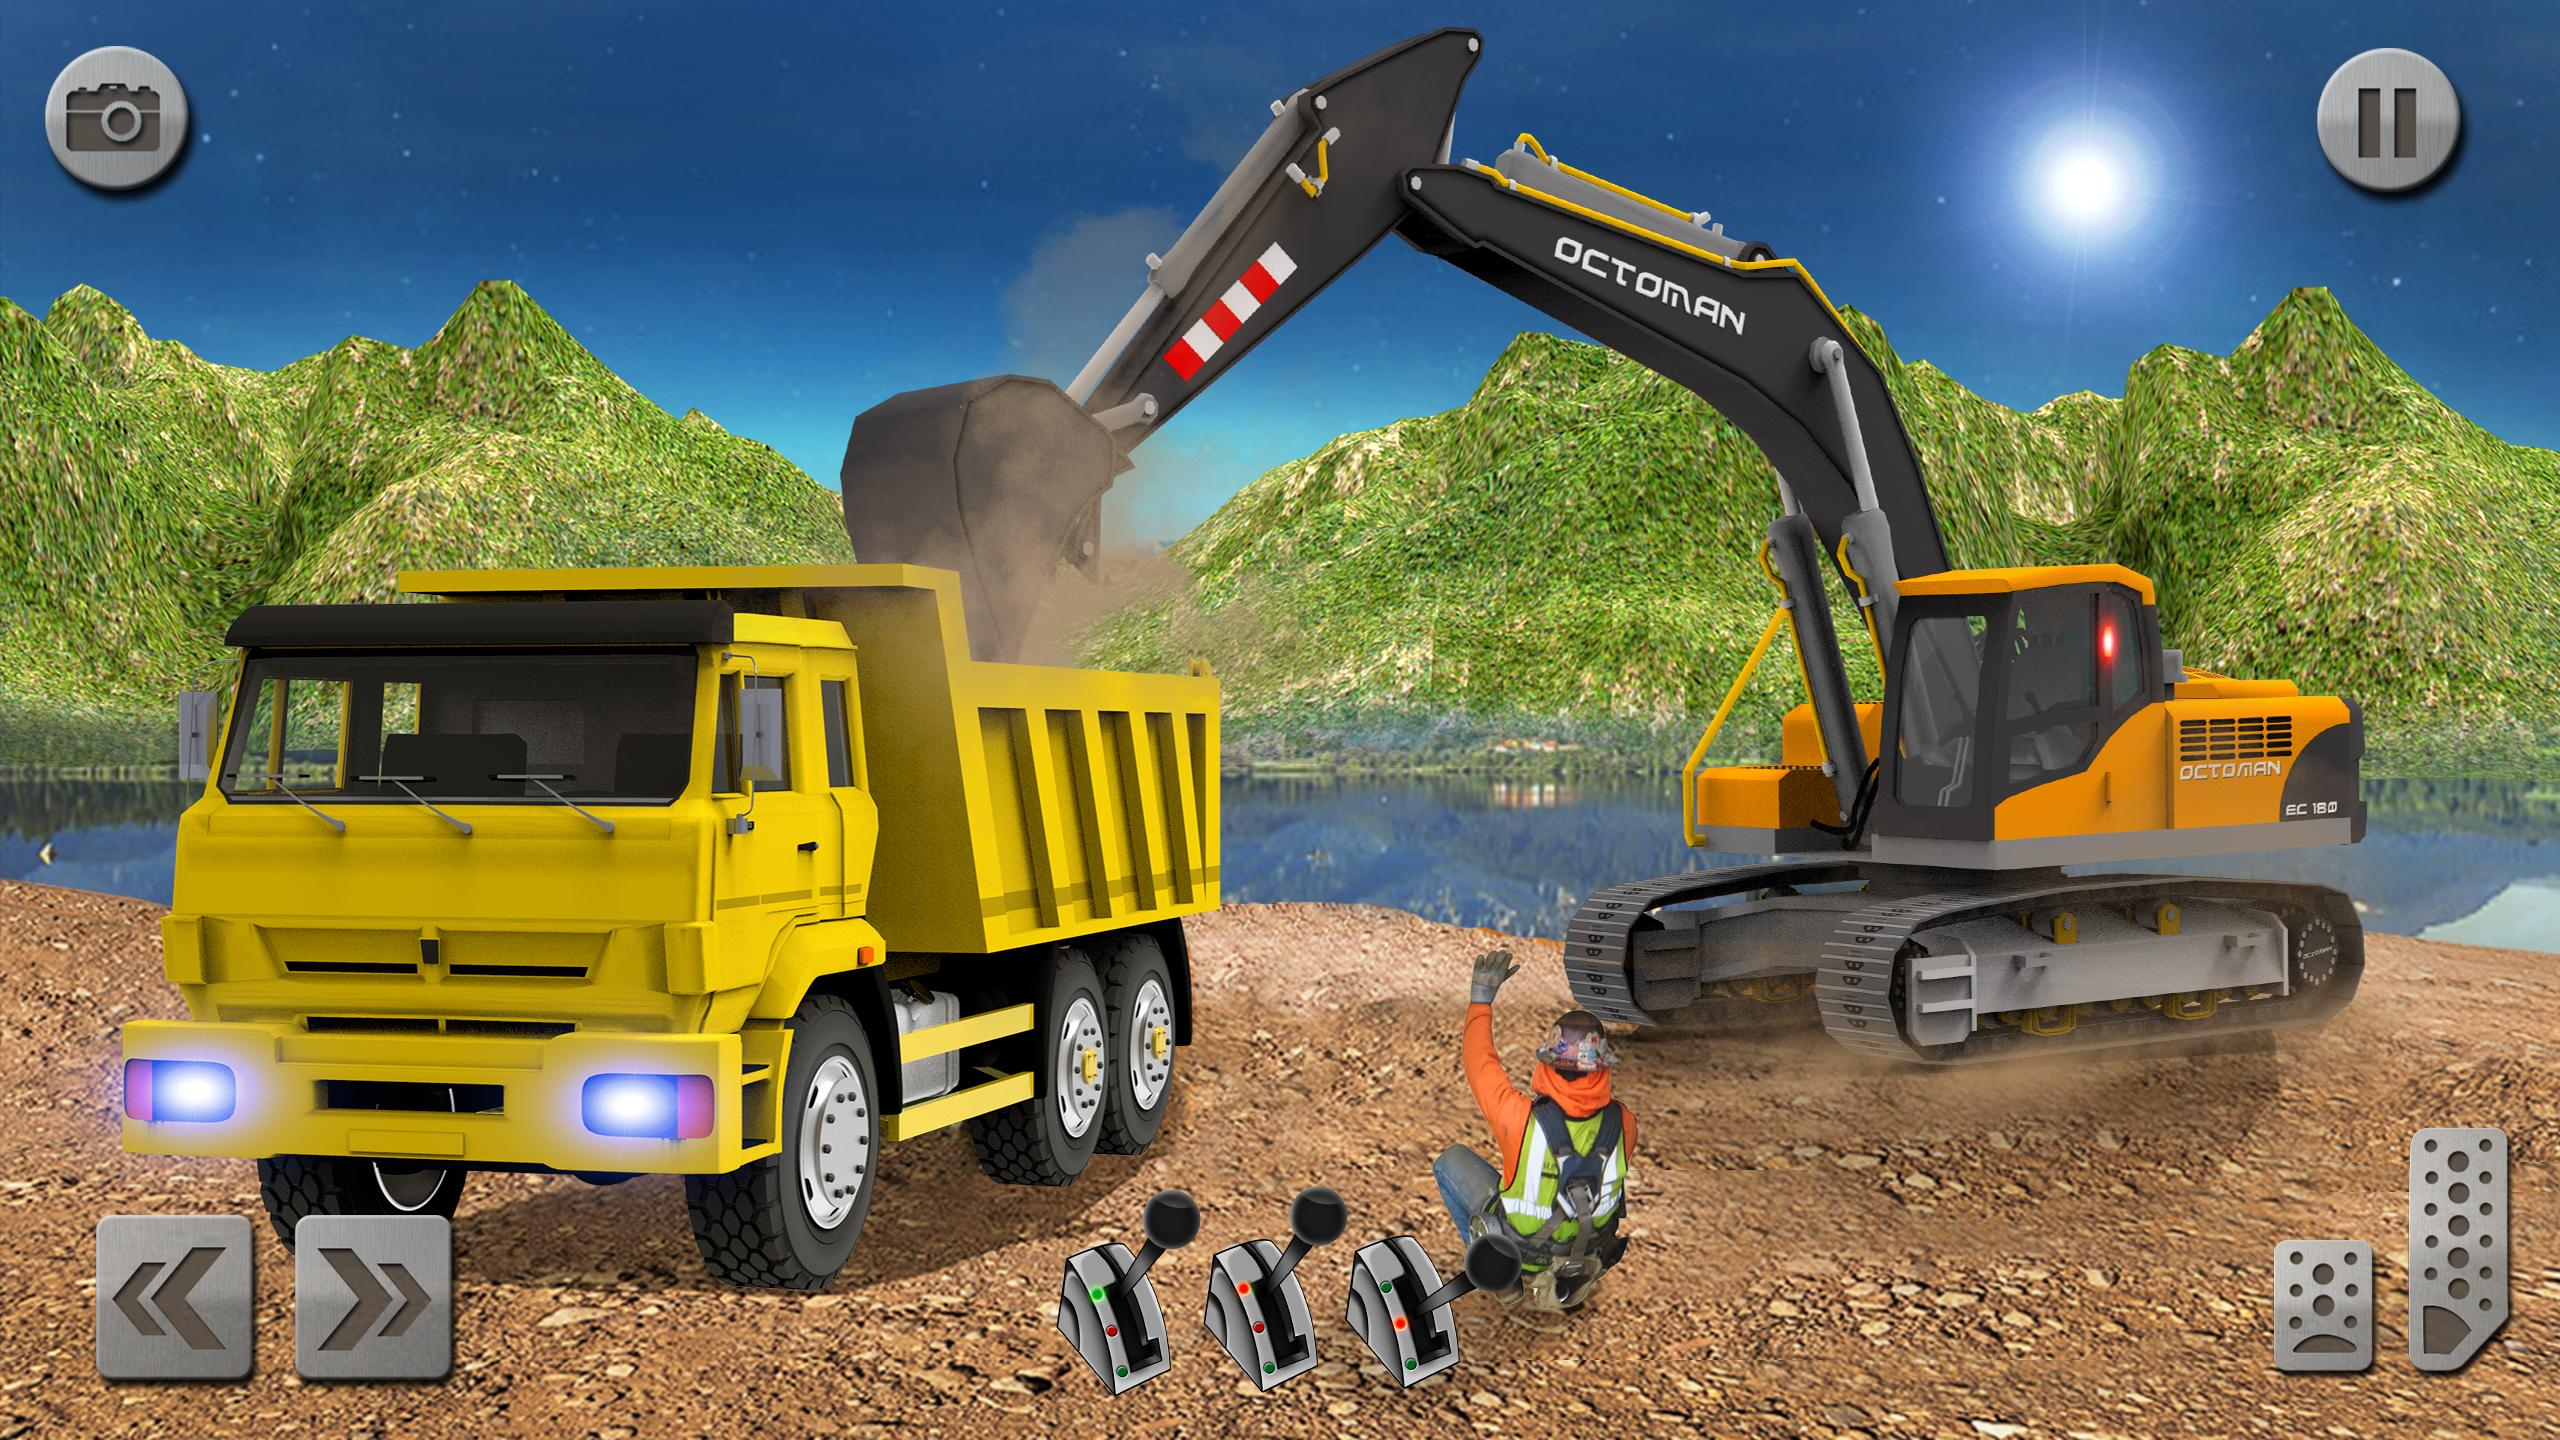 Sand Excavator Truck Driving Rescue Simulator game 5.2 Screenshot 7